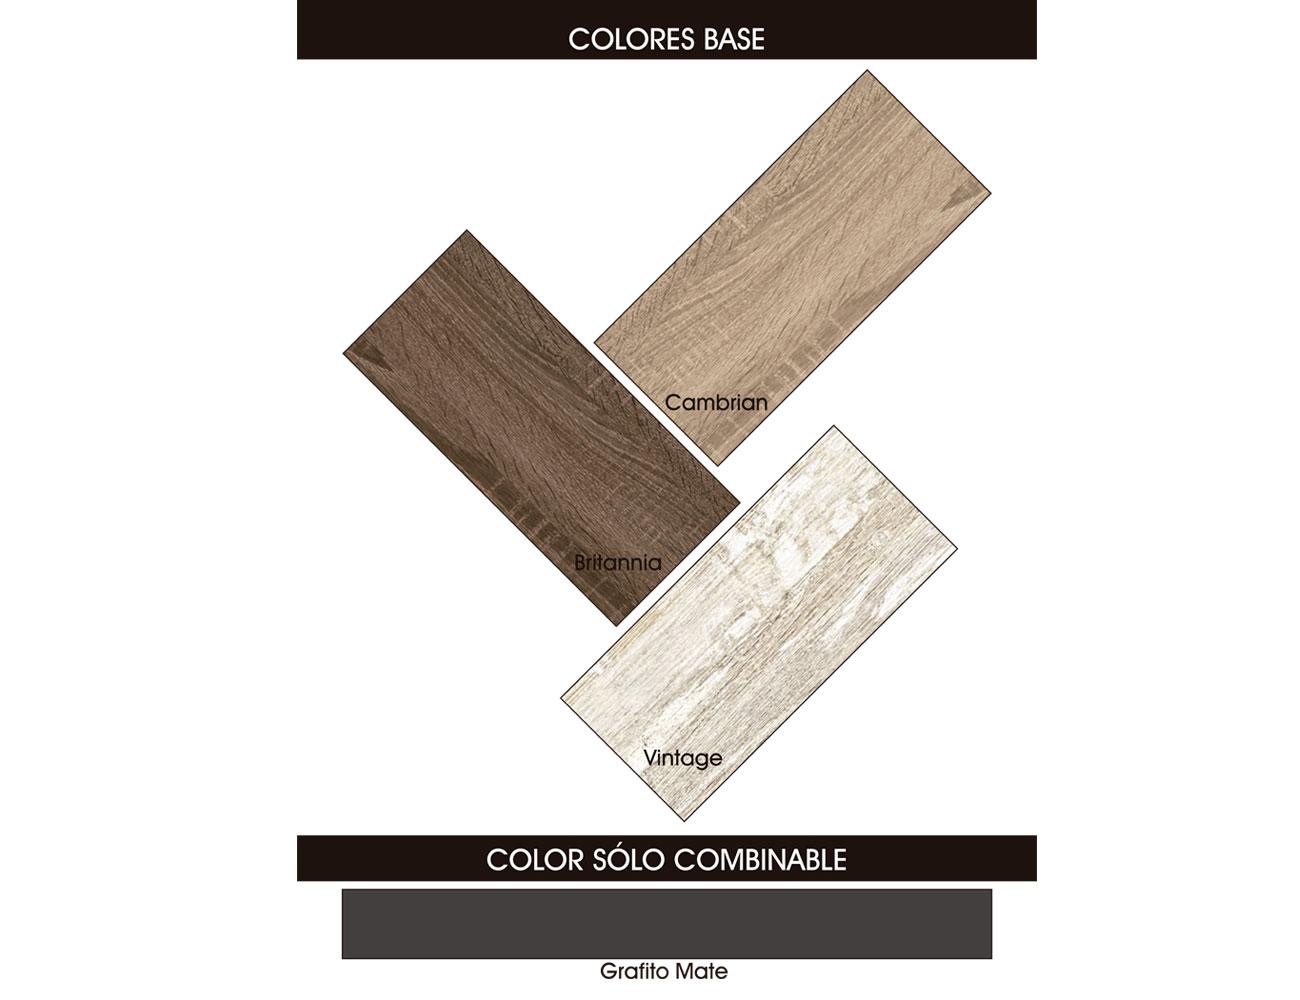 Colores 248